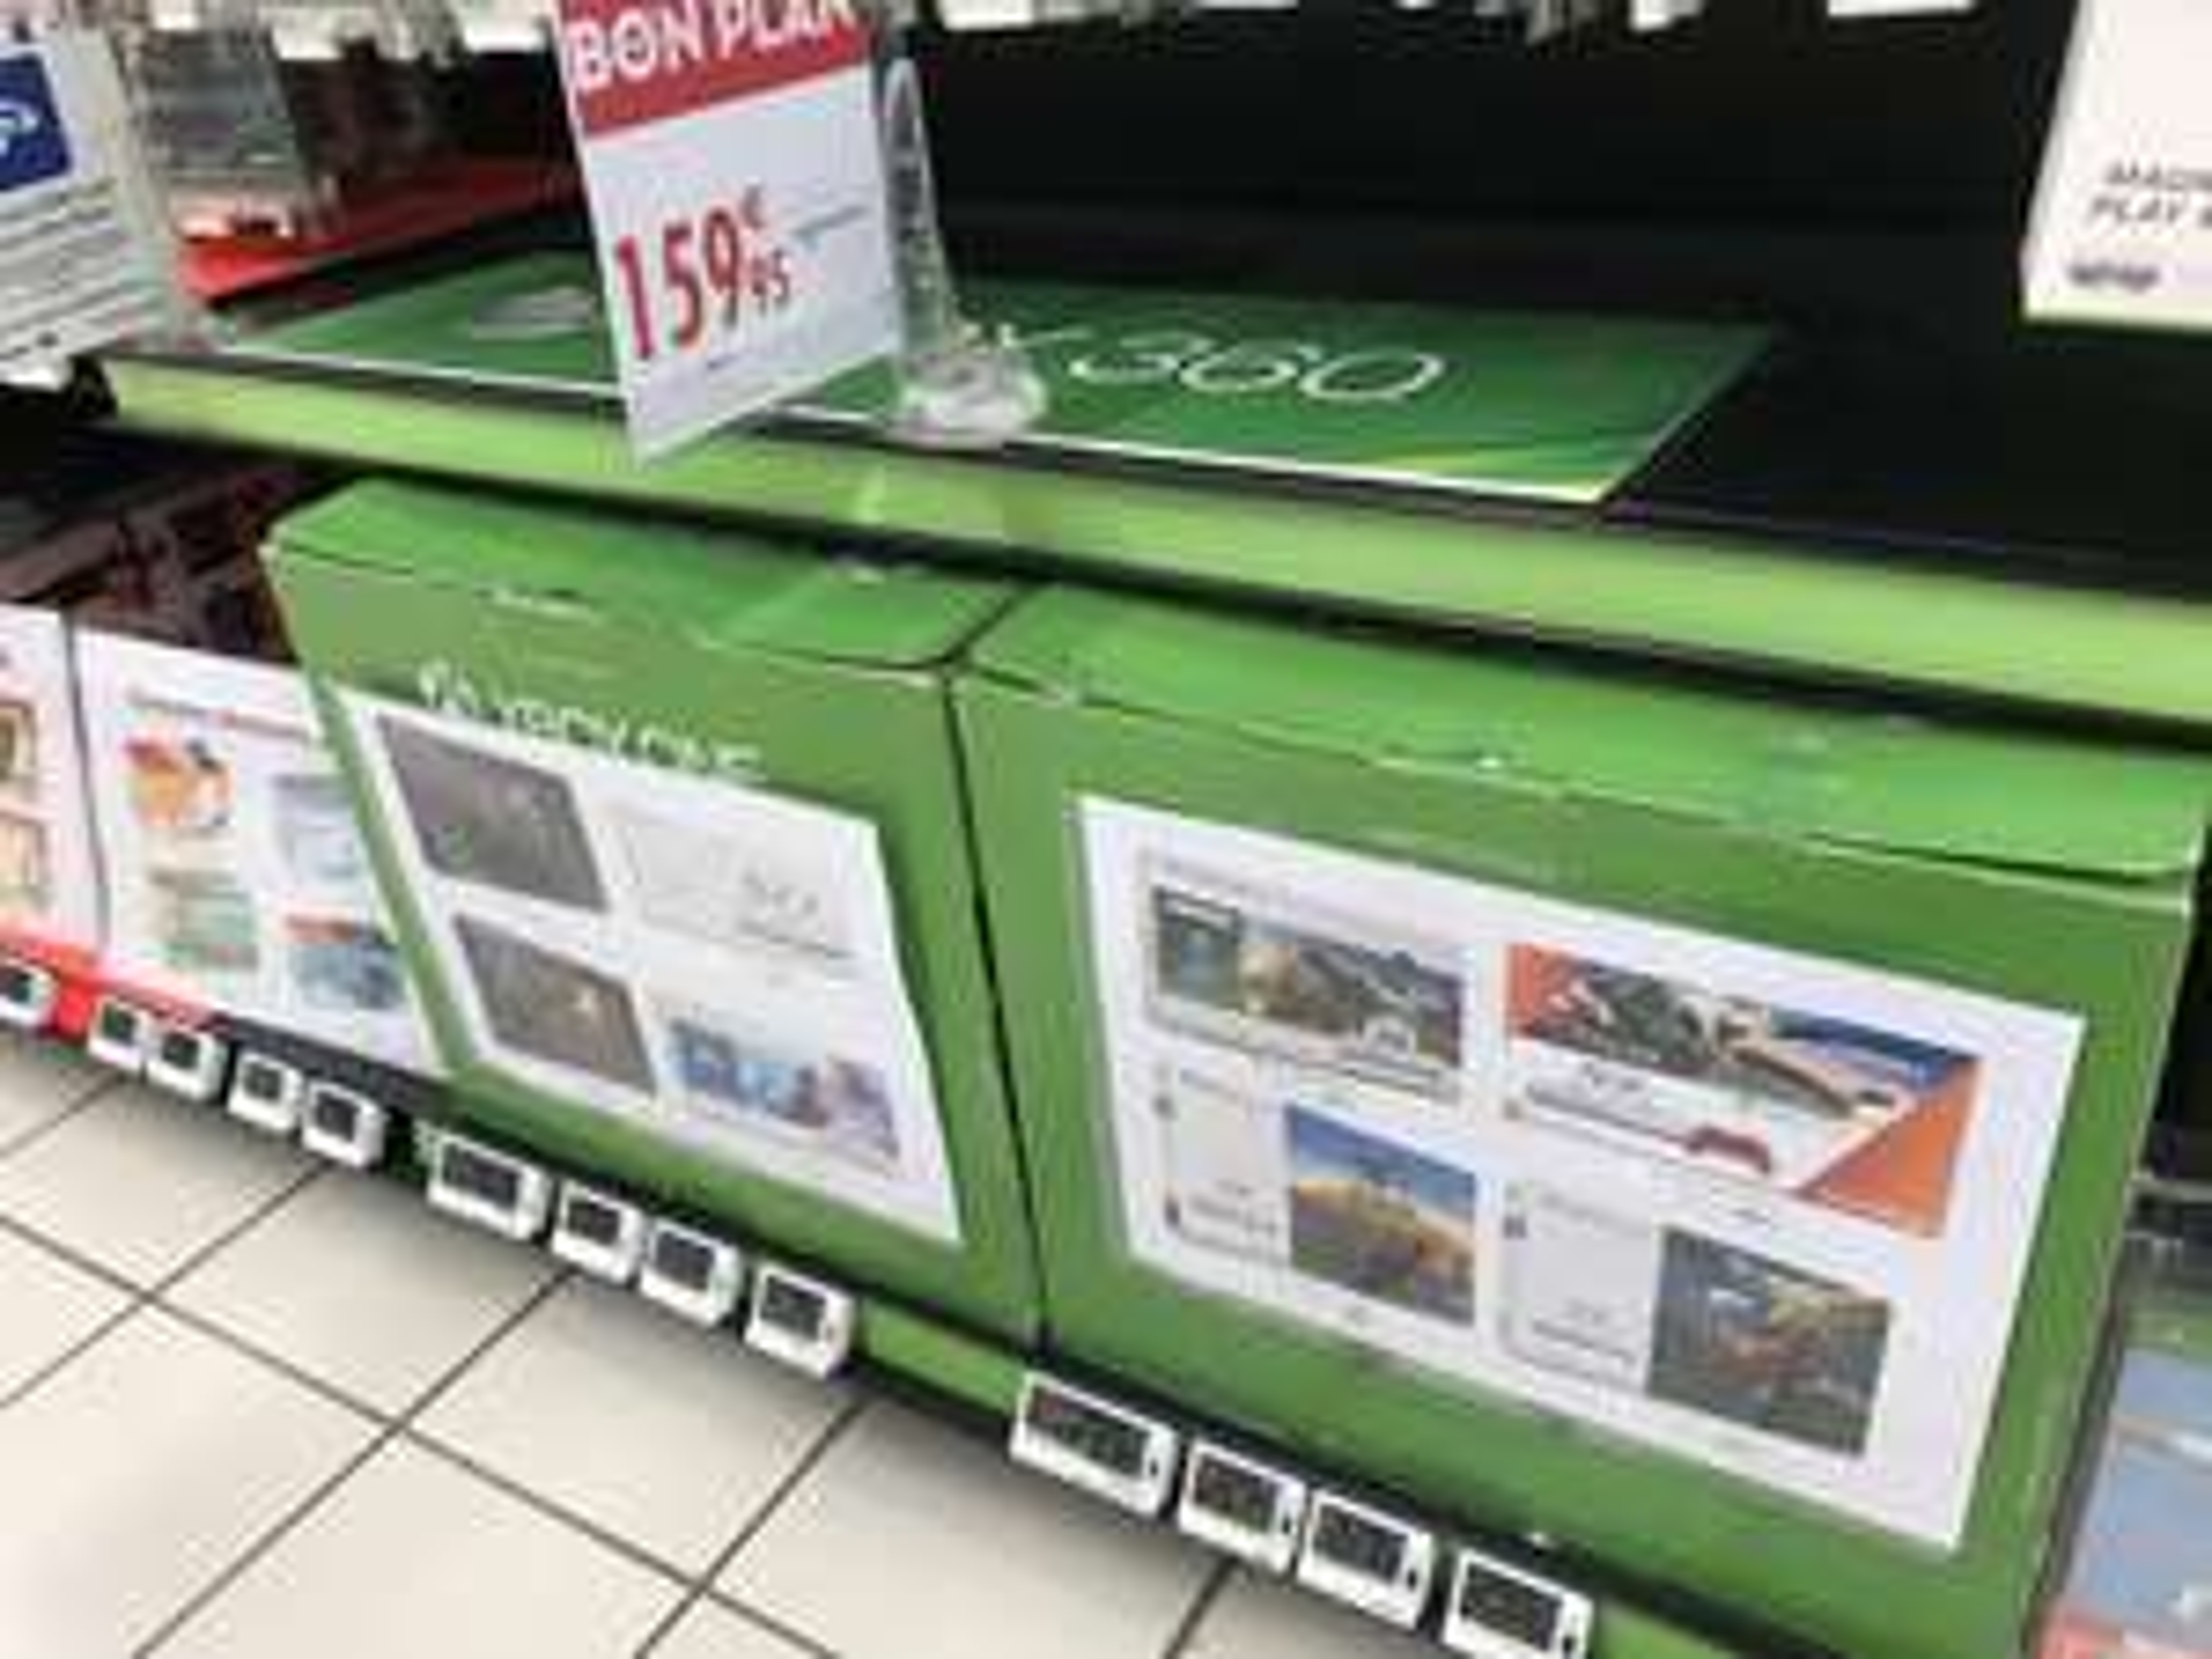 Sélection de packs console Microsoft Xbox One S (1 To) à 159.95€ - Ex : Xbox One S (1 To) + Fortnite - Saint-Herblain (44)